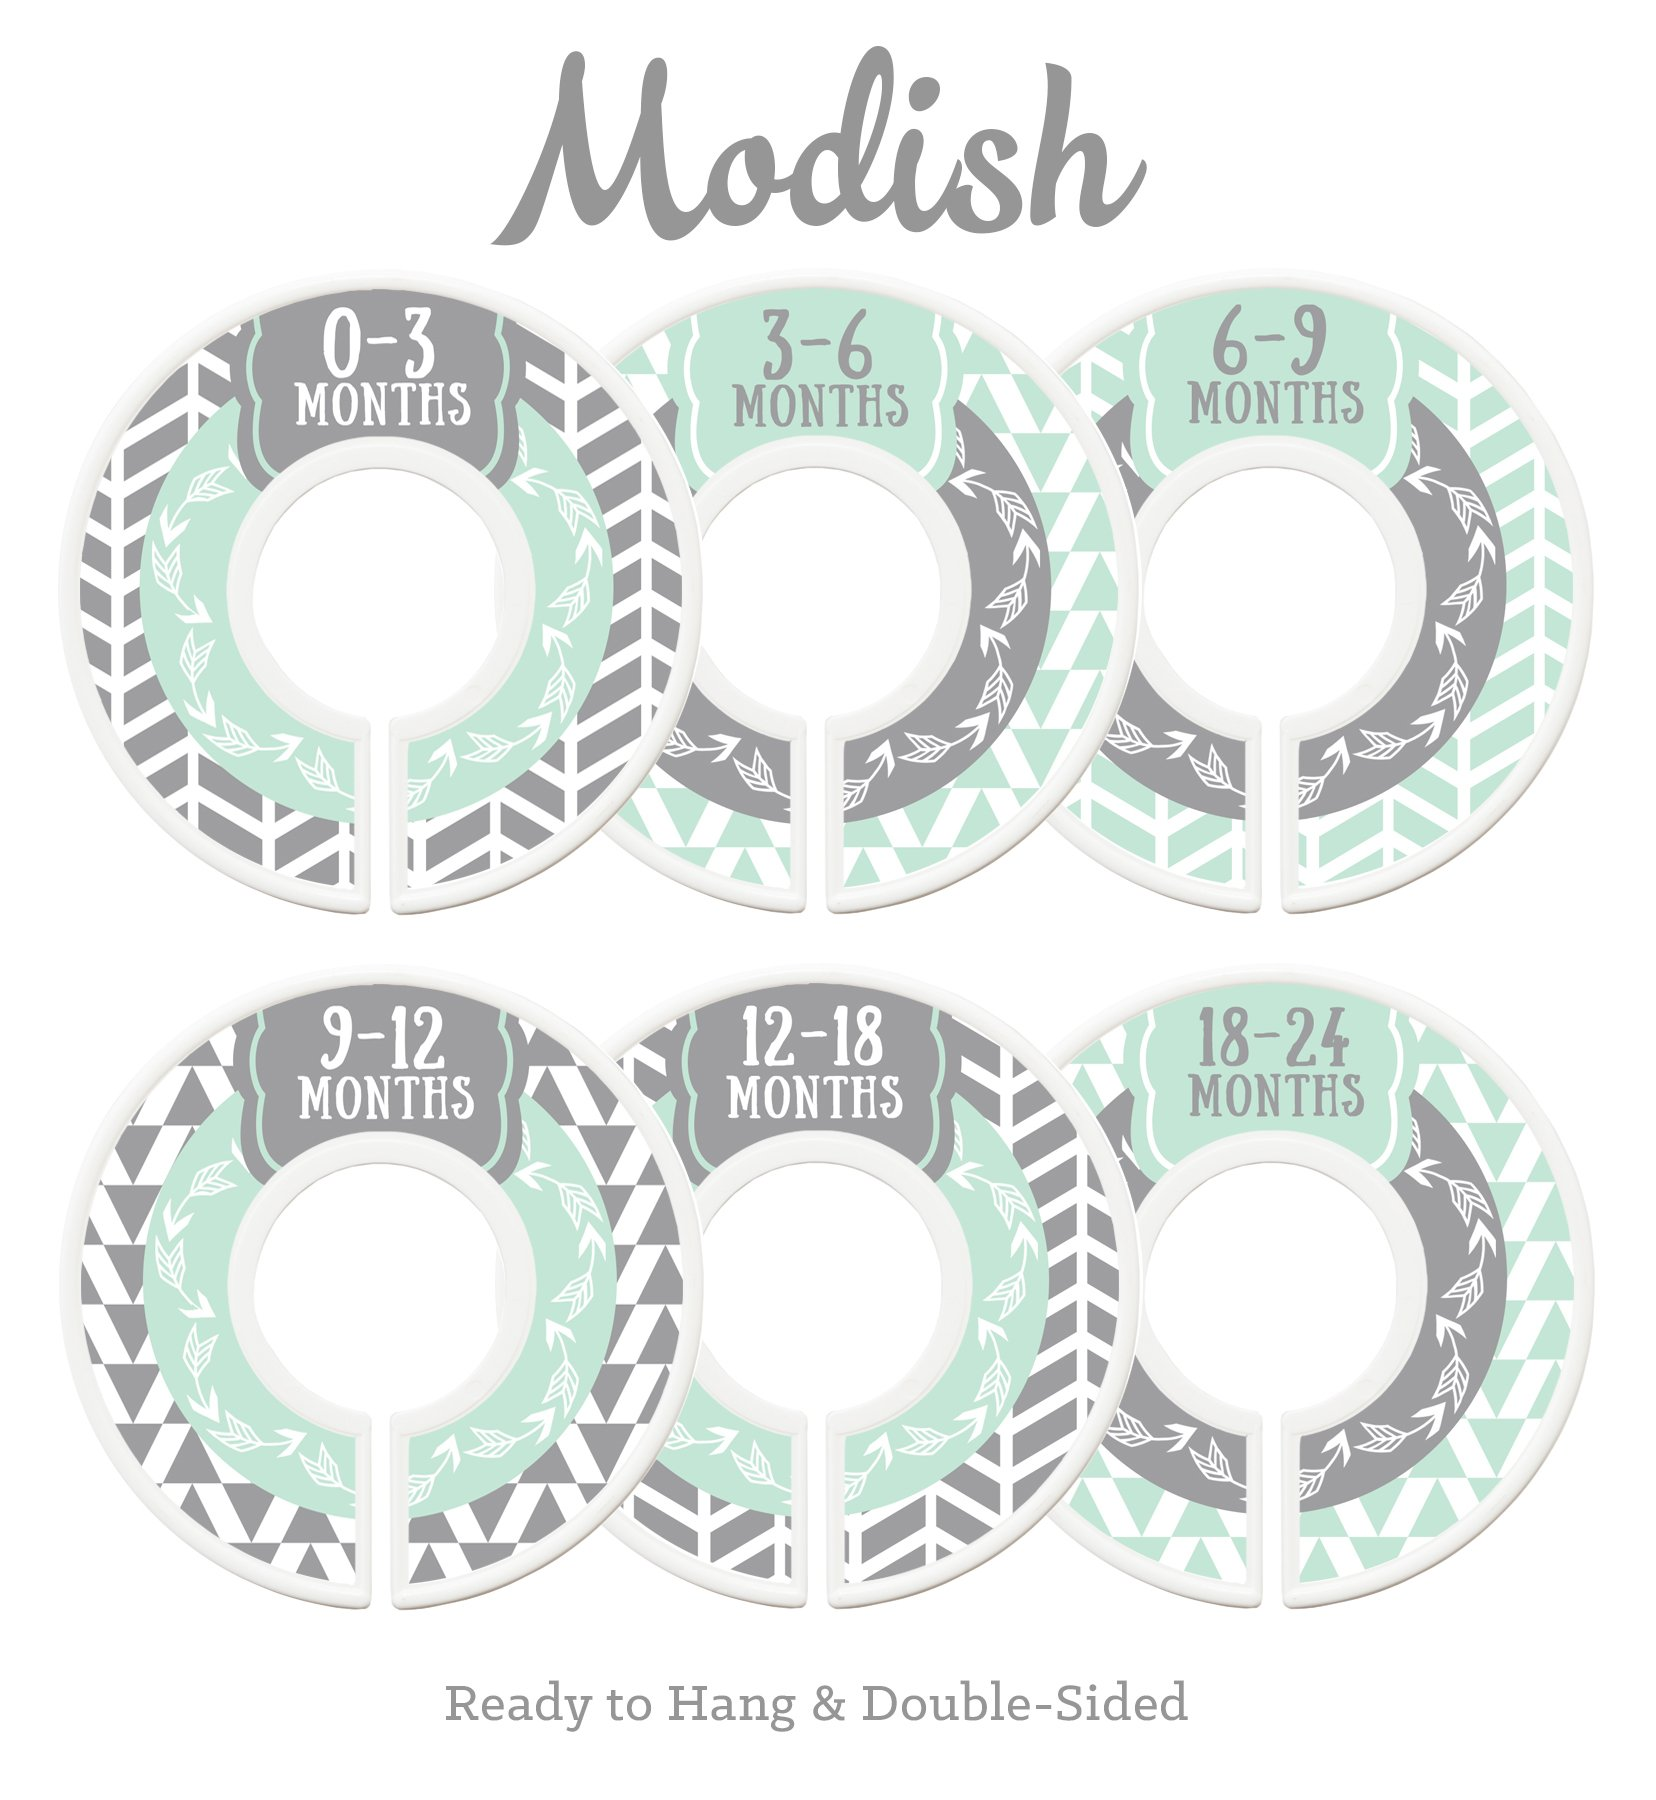 Modish Labels Baby Nursery Closet Dividers, Closet Organizers, Nursery Decor, Gender Neutral, Baby Boy, Baby Girl, Woodland, Arrow, Tribal, Mint, Grey